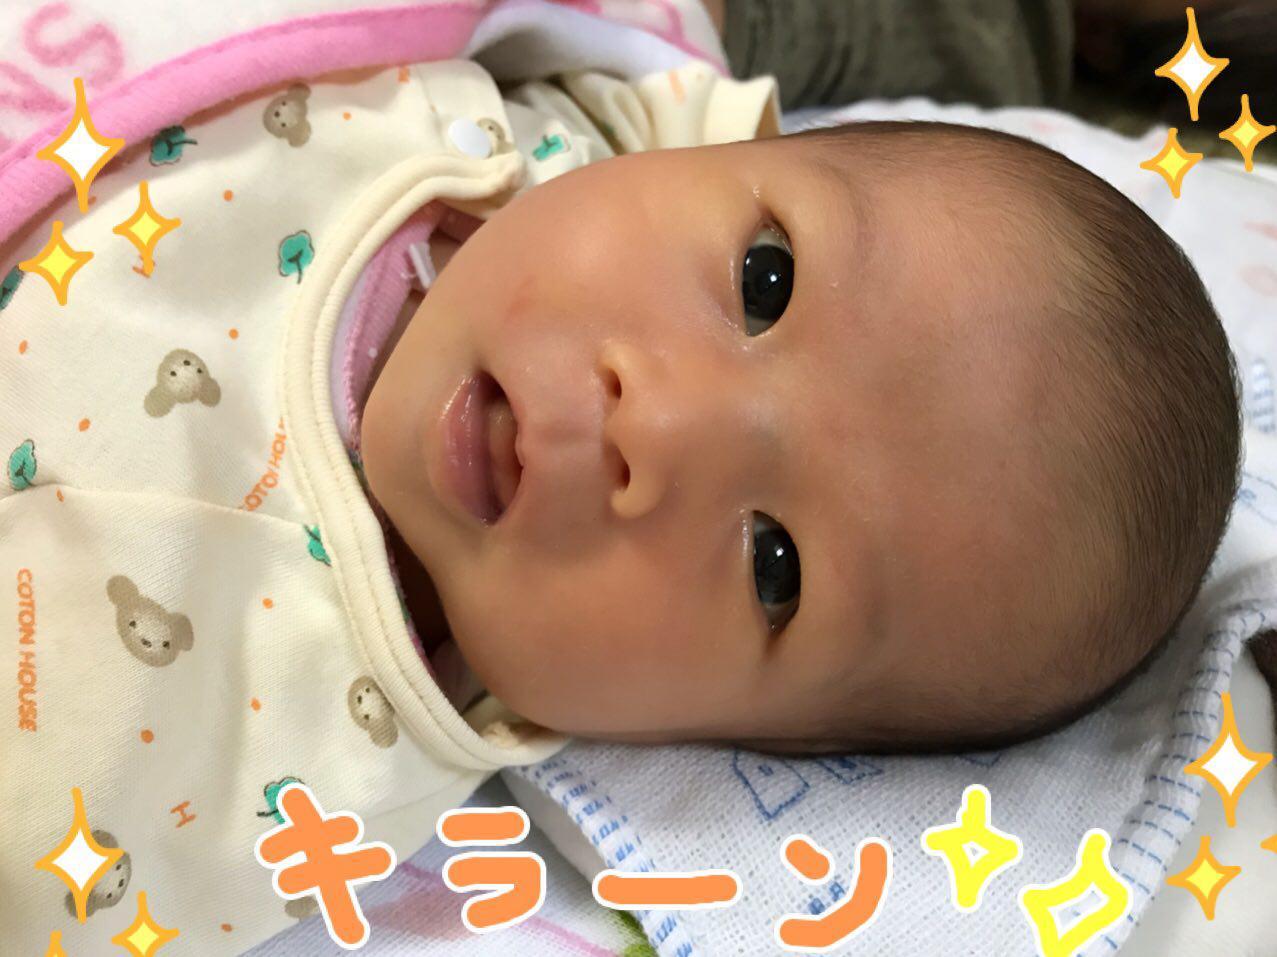 photo_2018-05-13_20-54-56.jpg